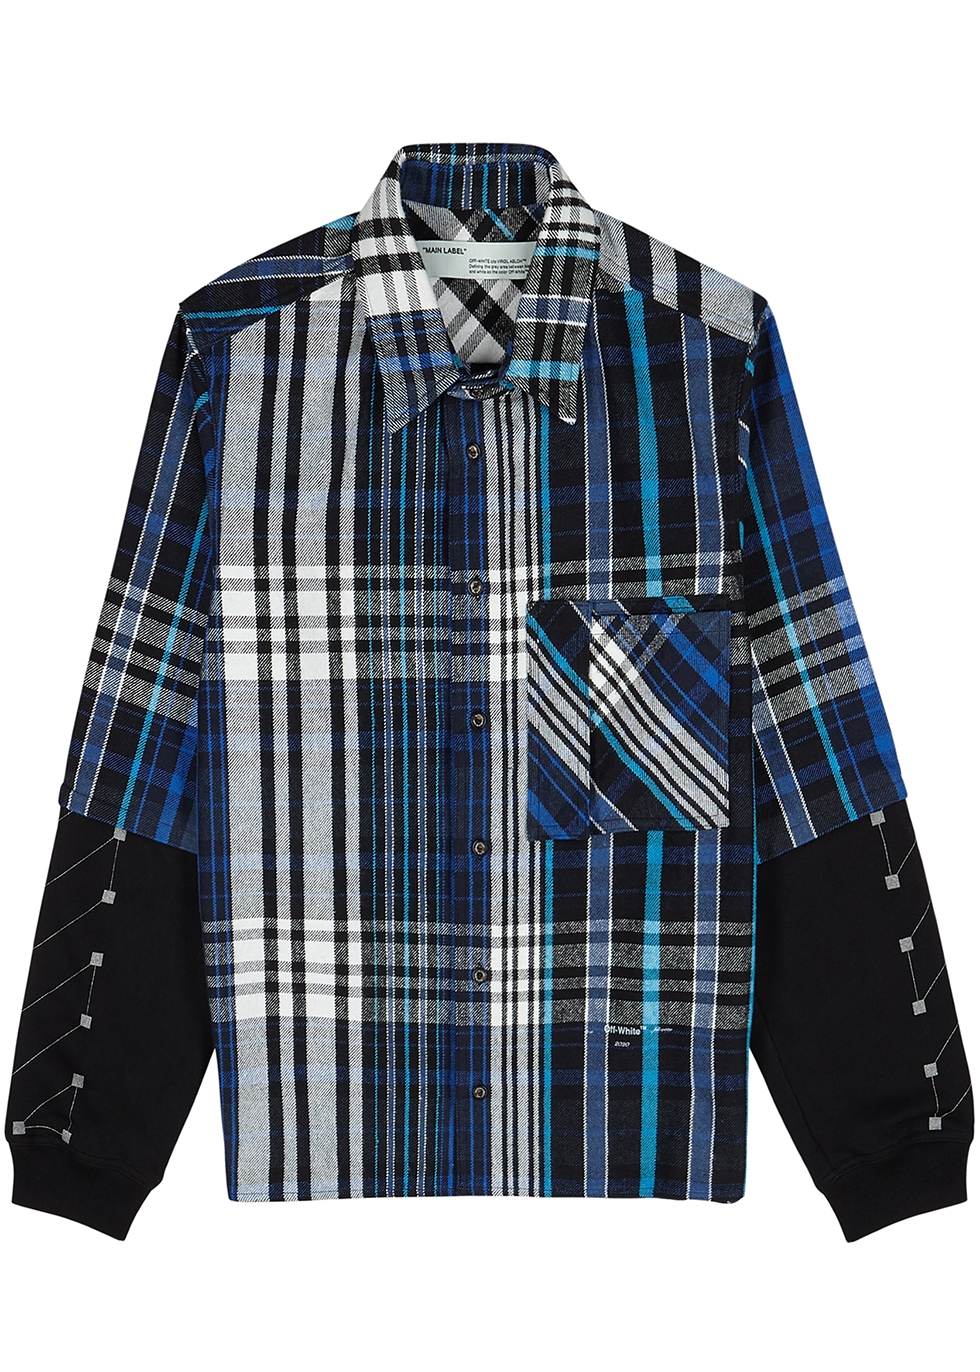 65d105a324 Men's Designer Jackets - Winter Jackets for Men - Harvey Nichols